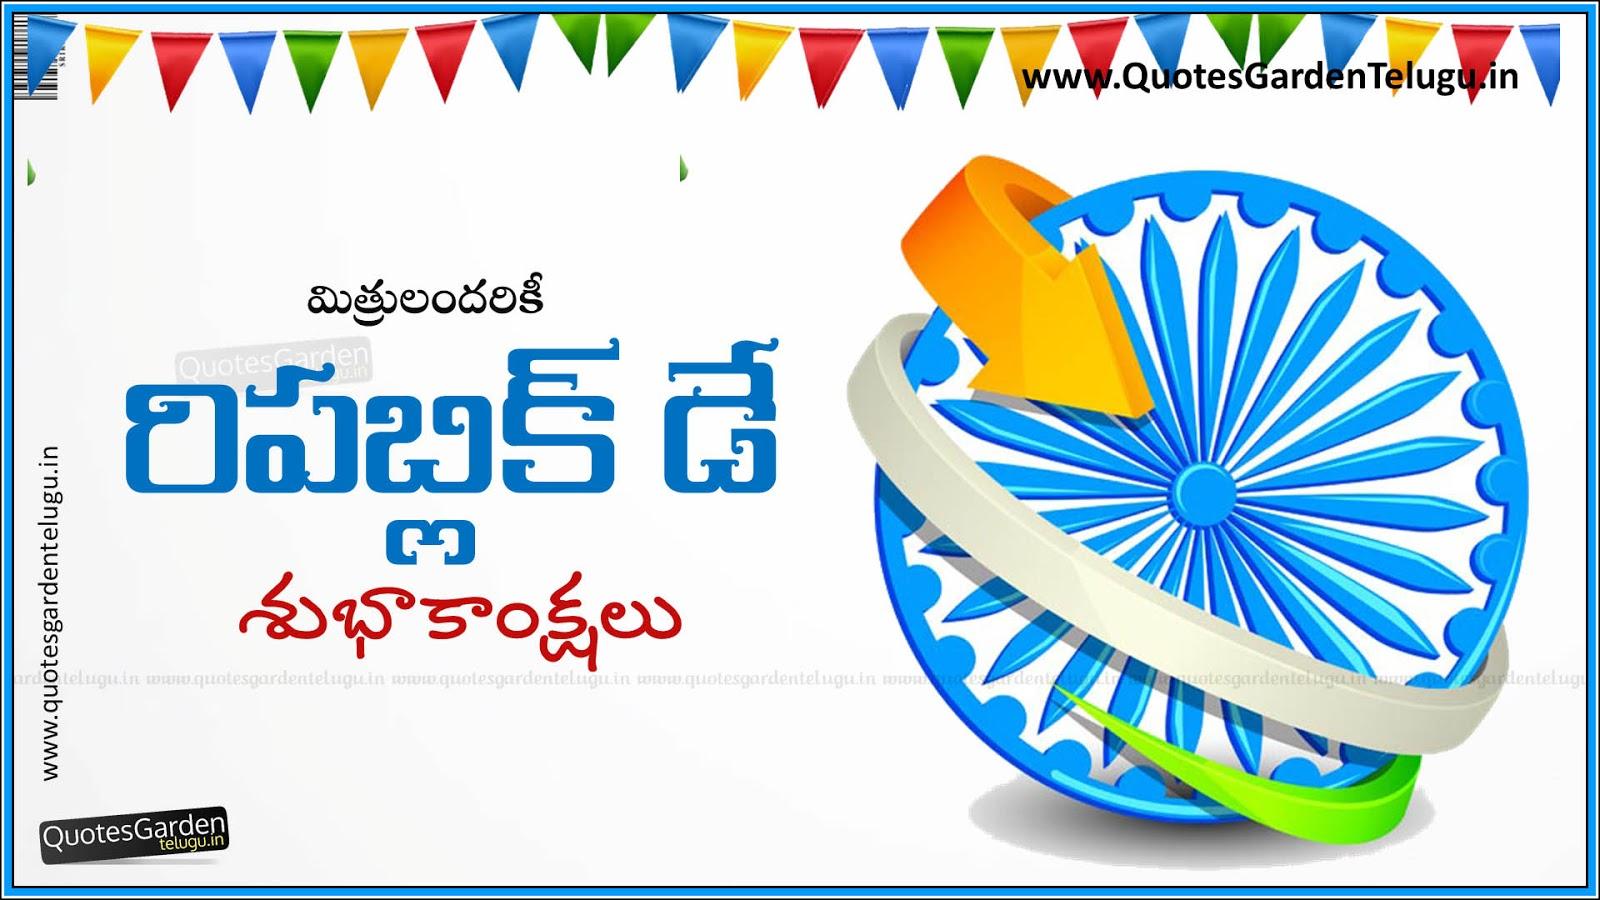 Telugu happy republic day e greeting cards quotes garden telugu telugu happy republic day e greeting cards m4hsunfo